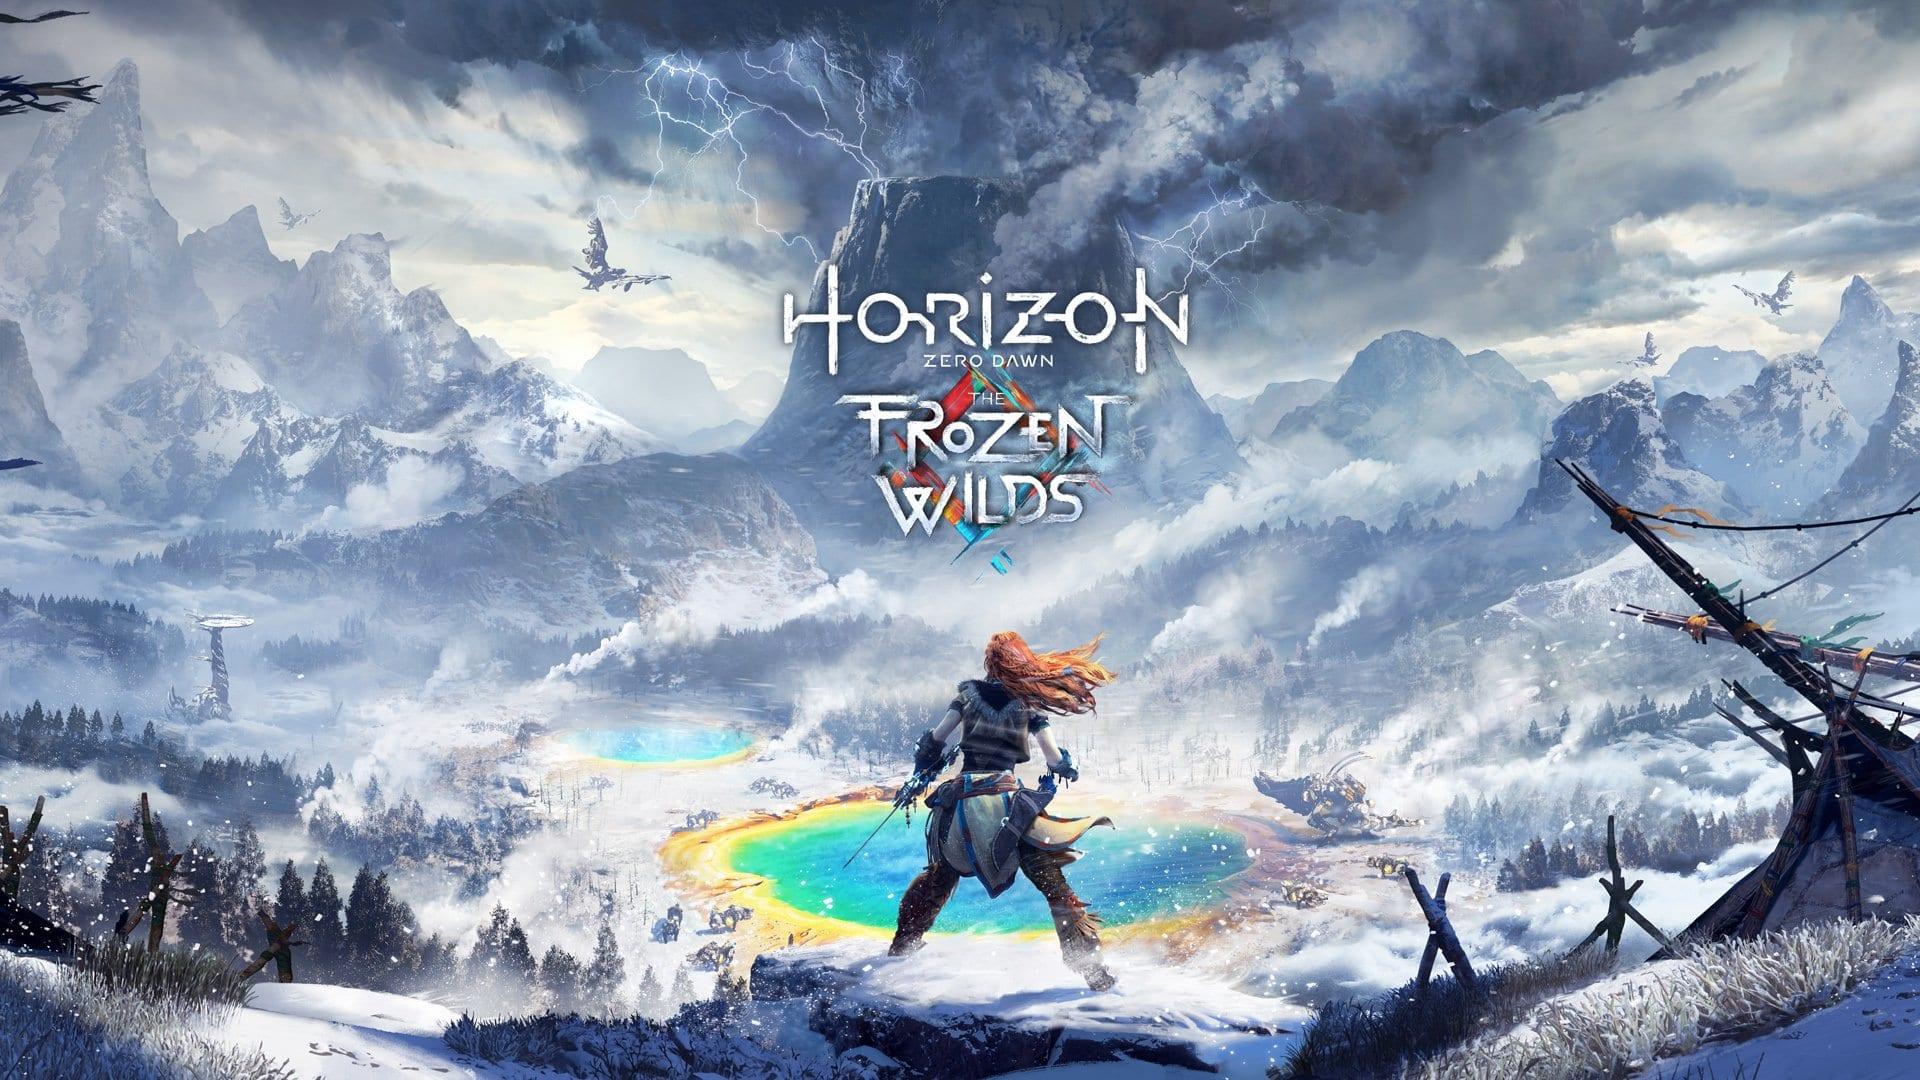 Horizon Zero Dawn: The Frozen Wilds Has a Release Date